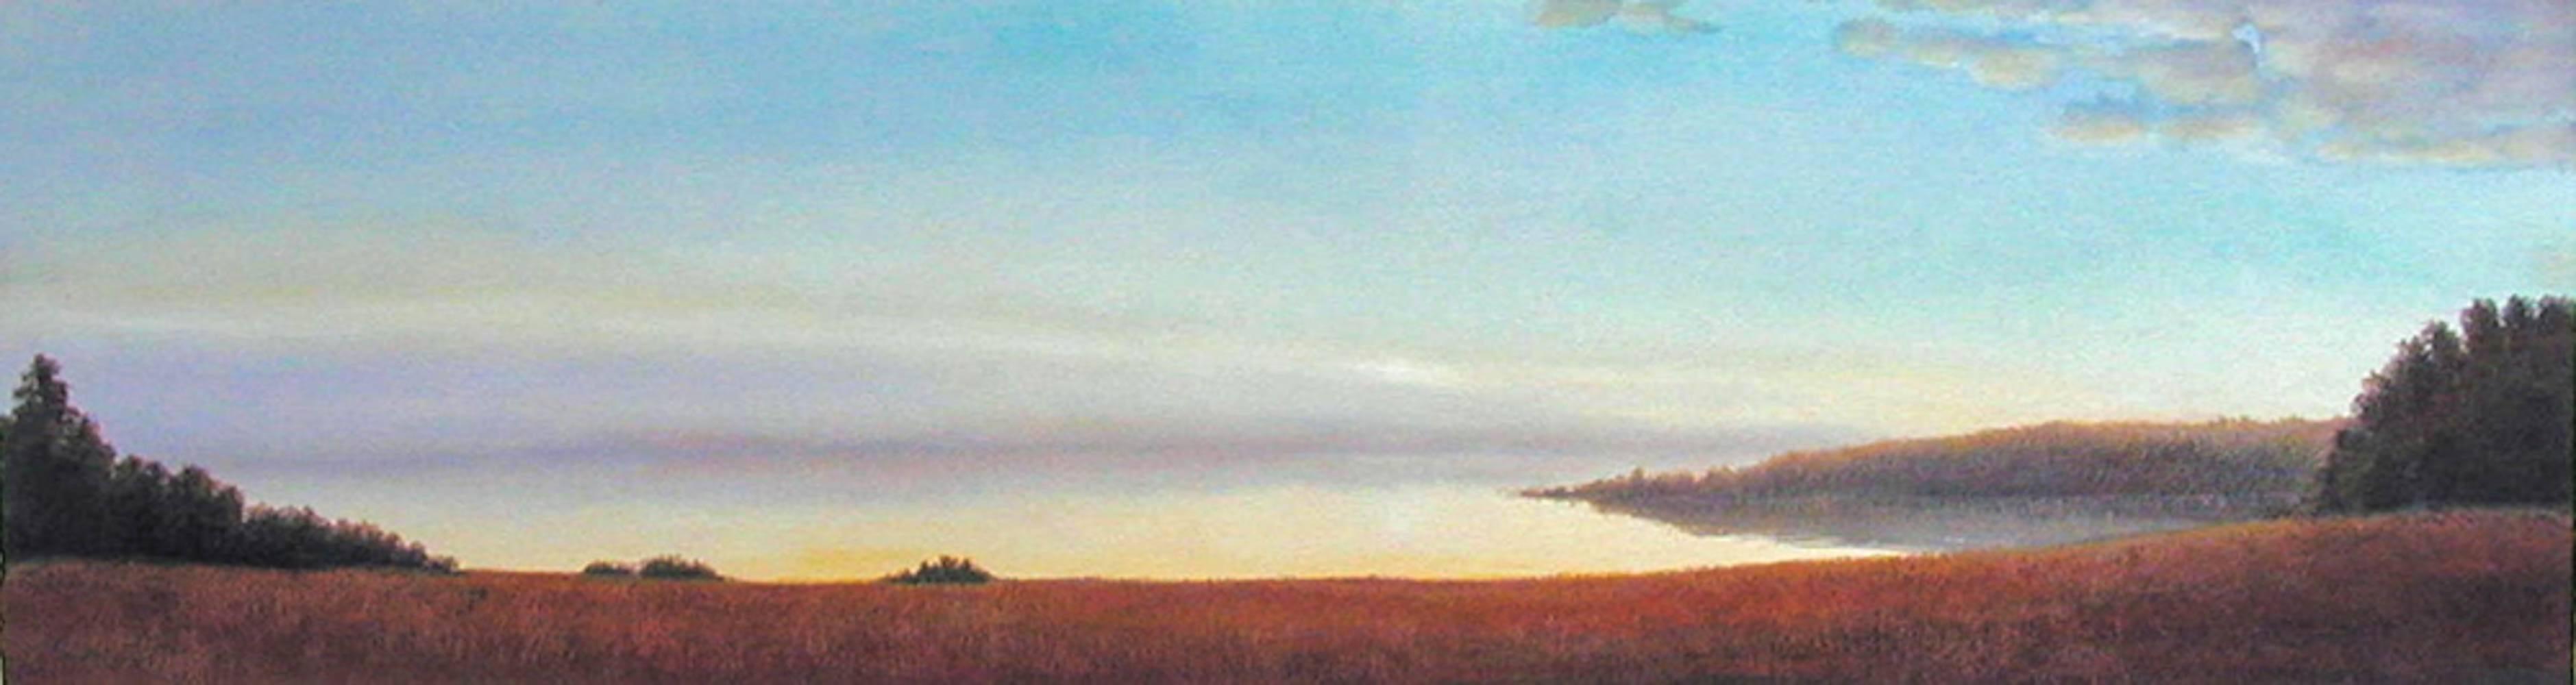 Penobscot Dawn 2